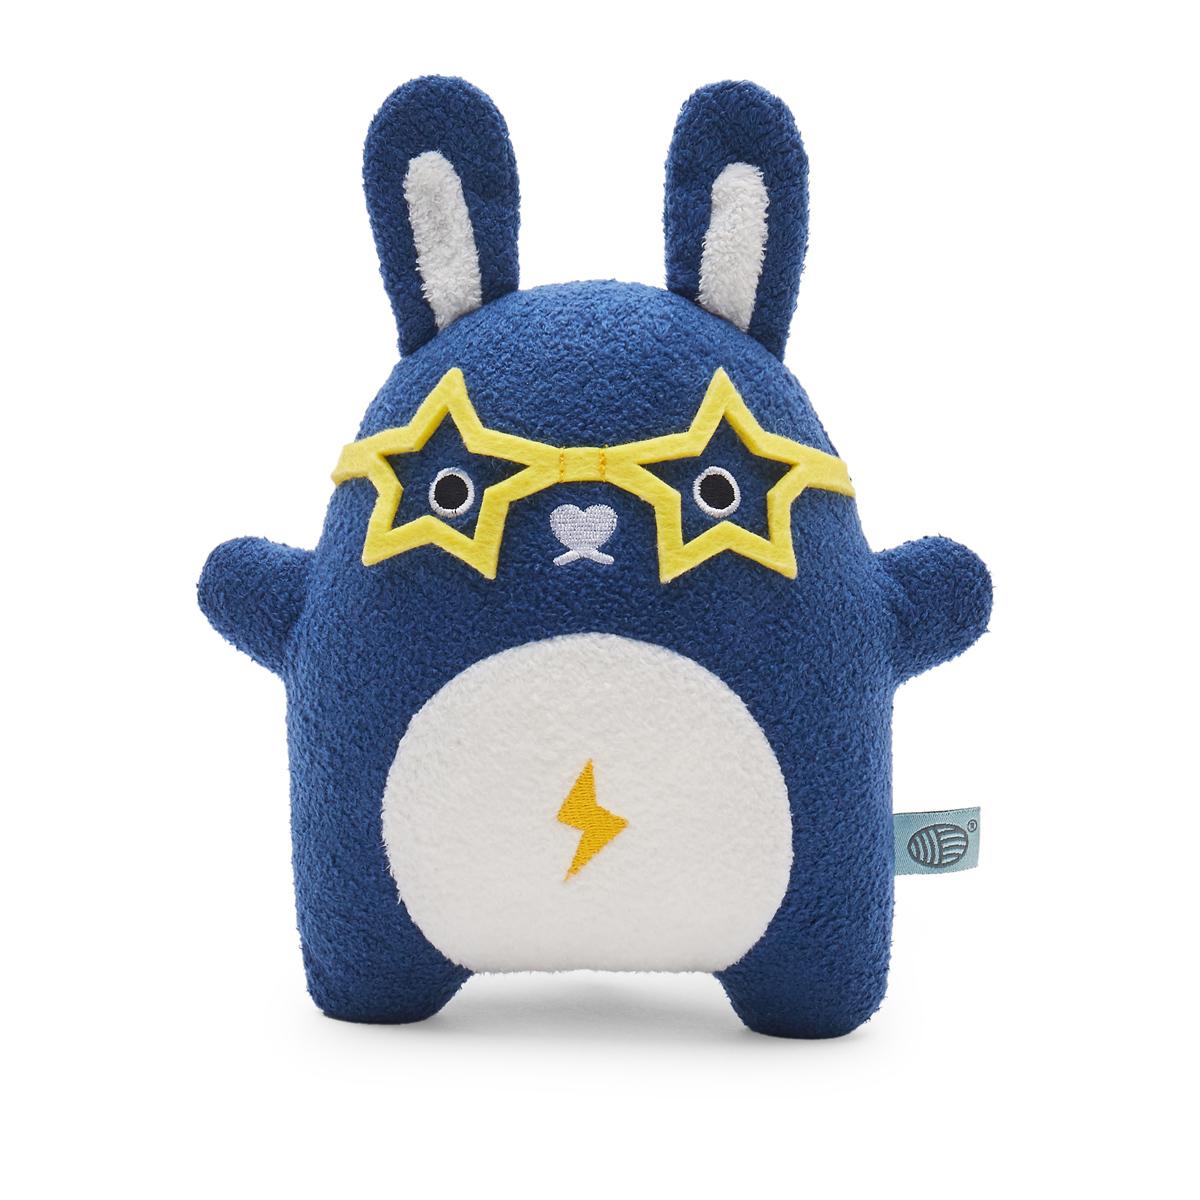 Peluche Ricejagger Rocker Rabbit Ricejagger Rocker Rabbit